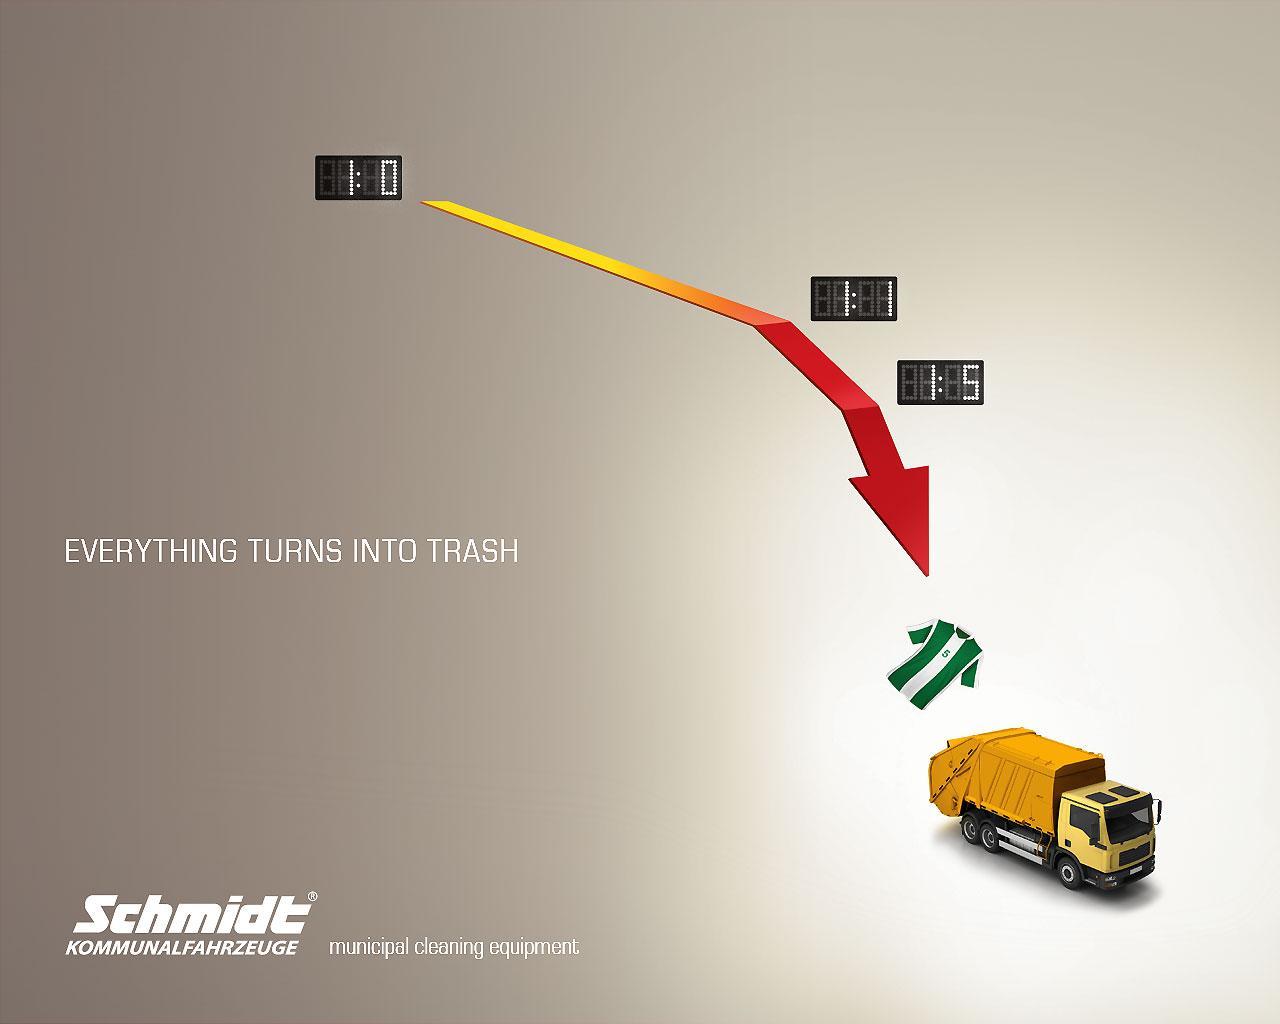 Schmidt Kommunalfahrzeuge Print Ad -  Football